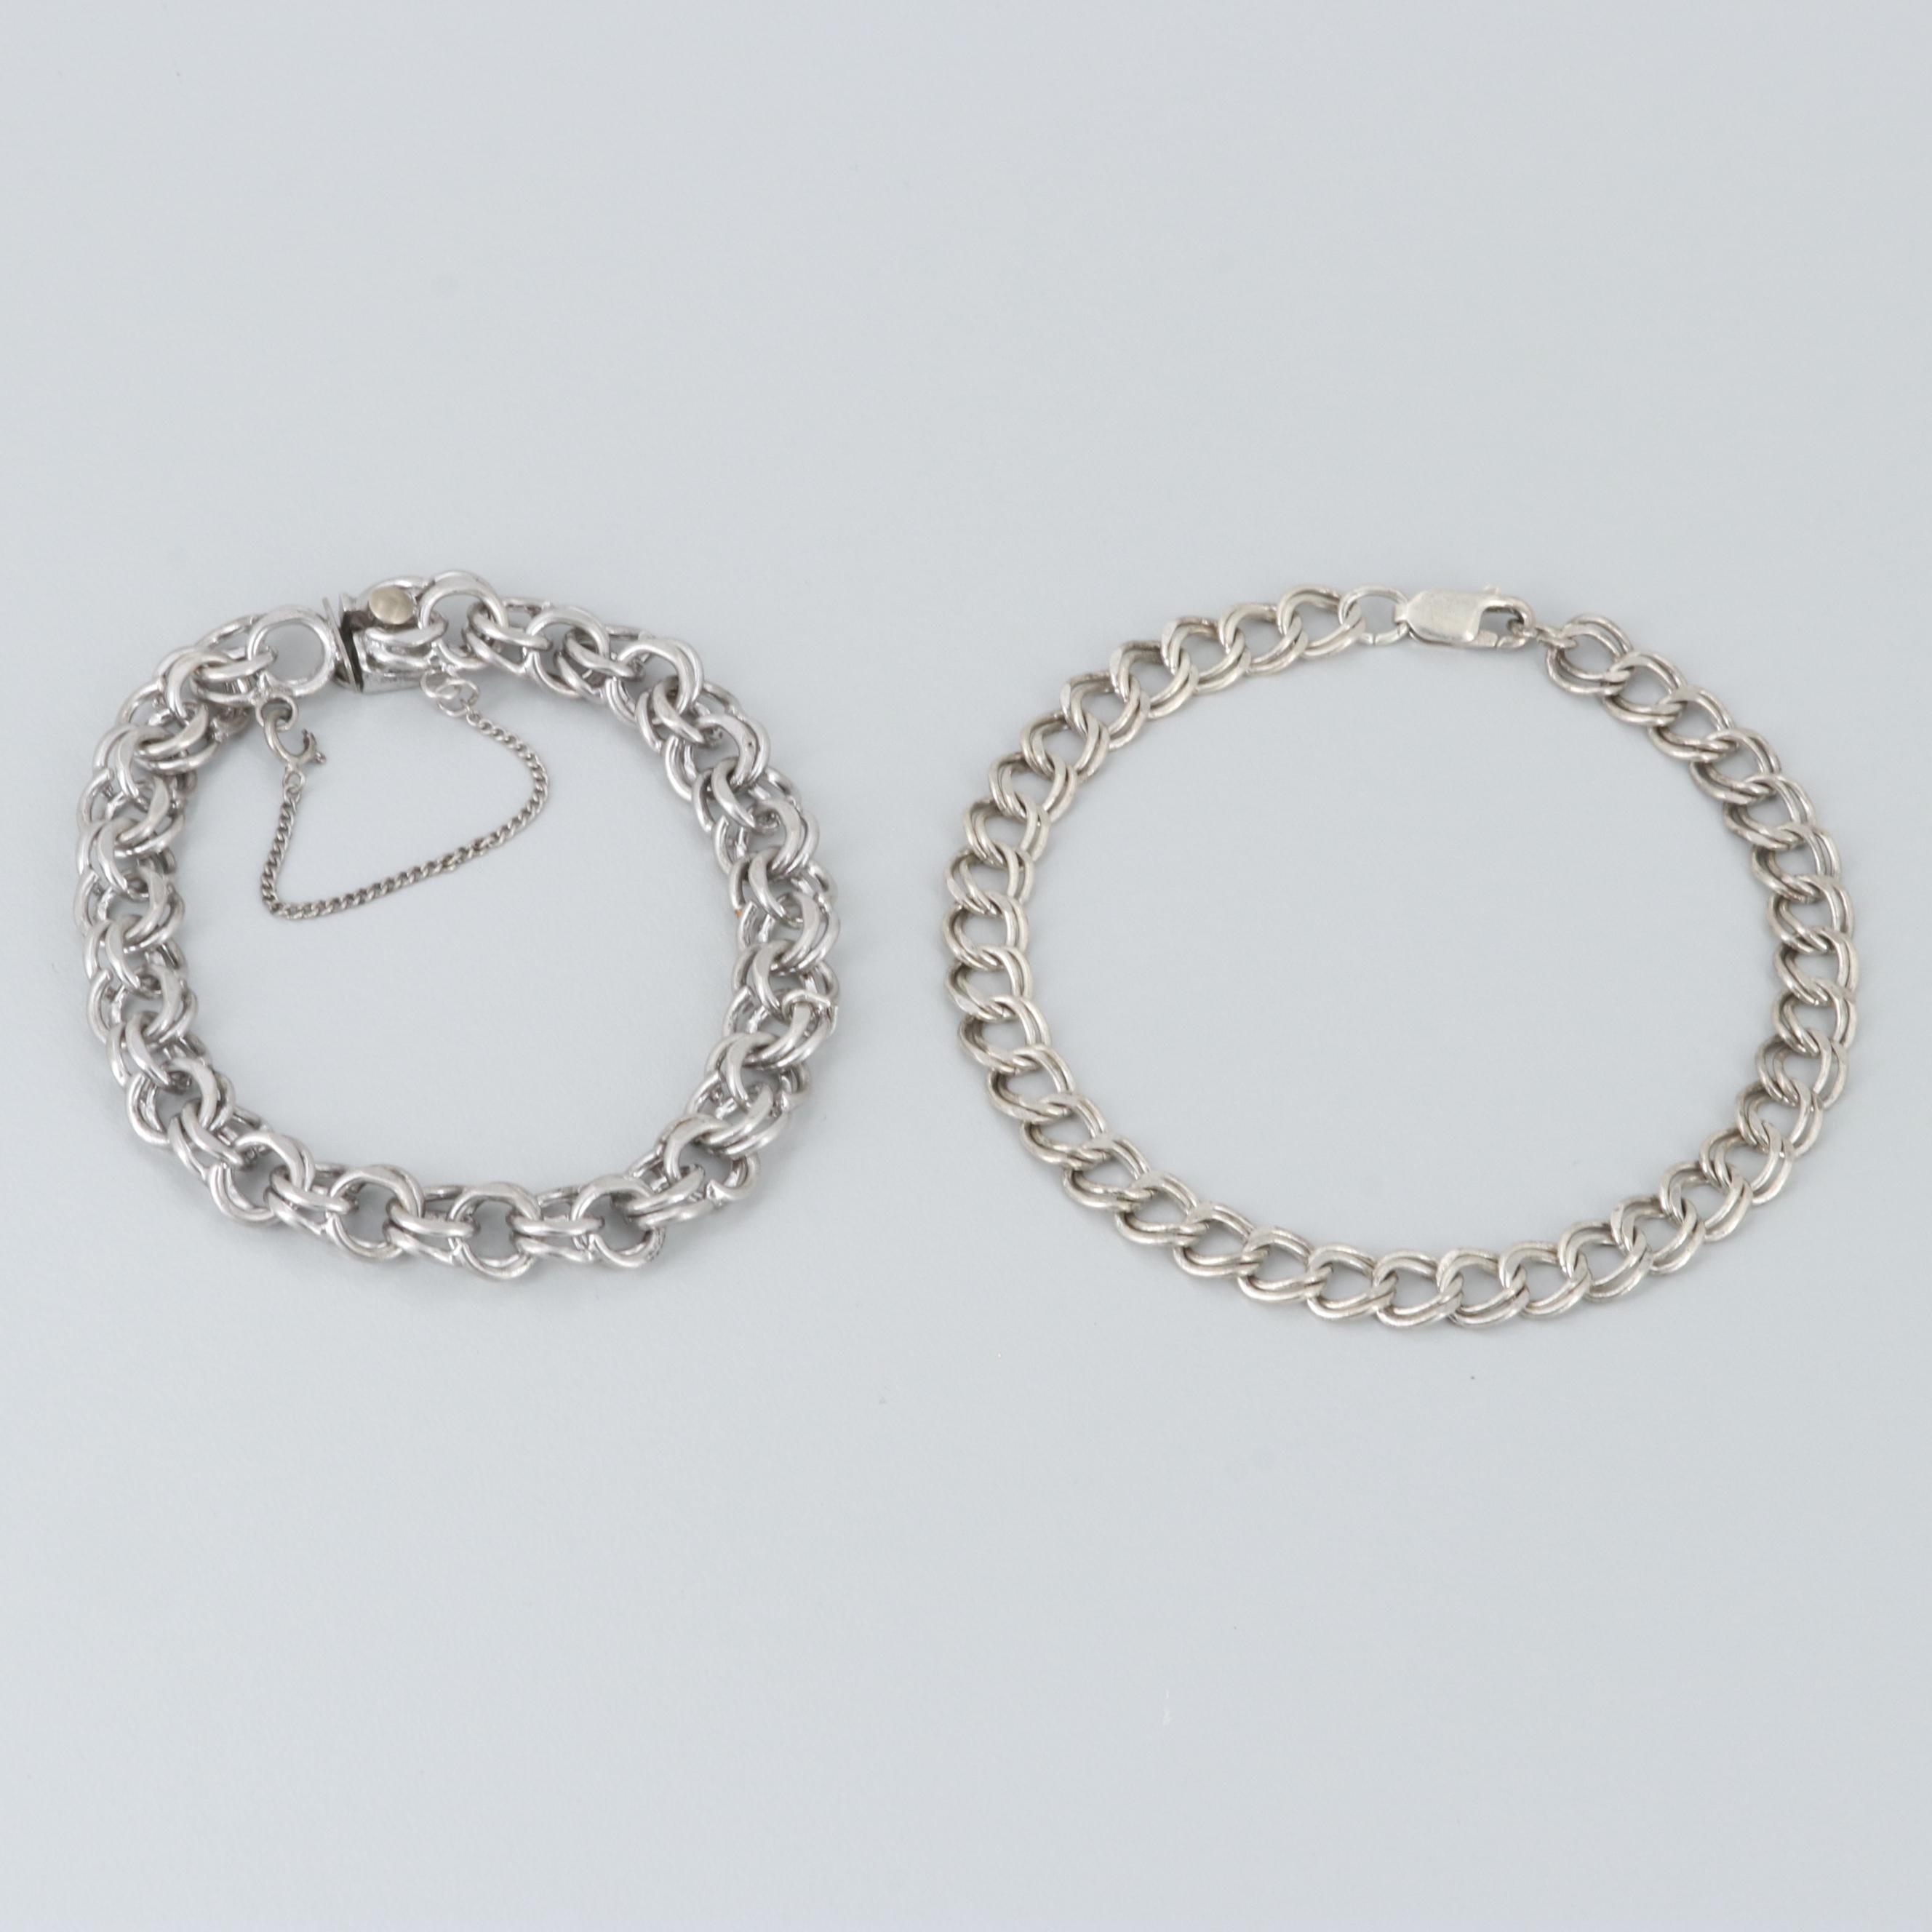 Pair of Vintage Sterling Silver Charm Bracelets